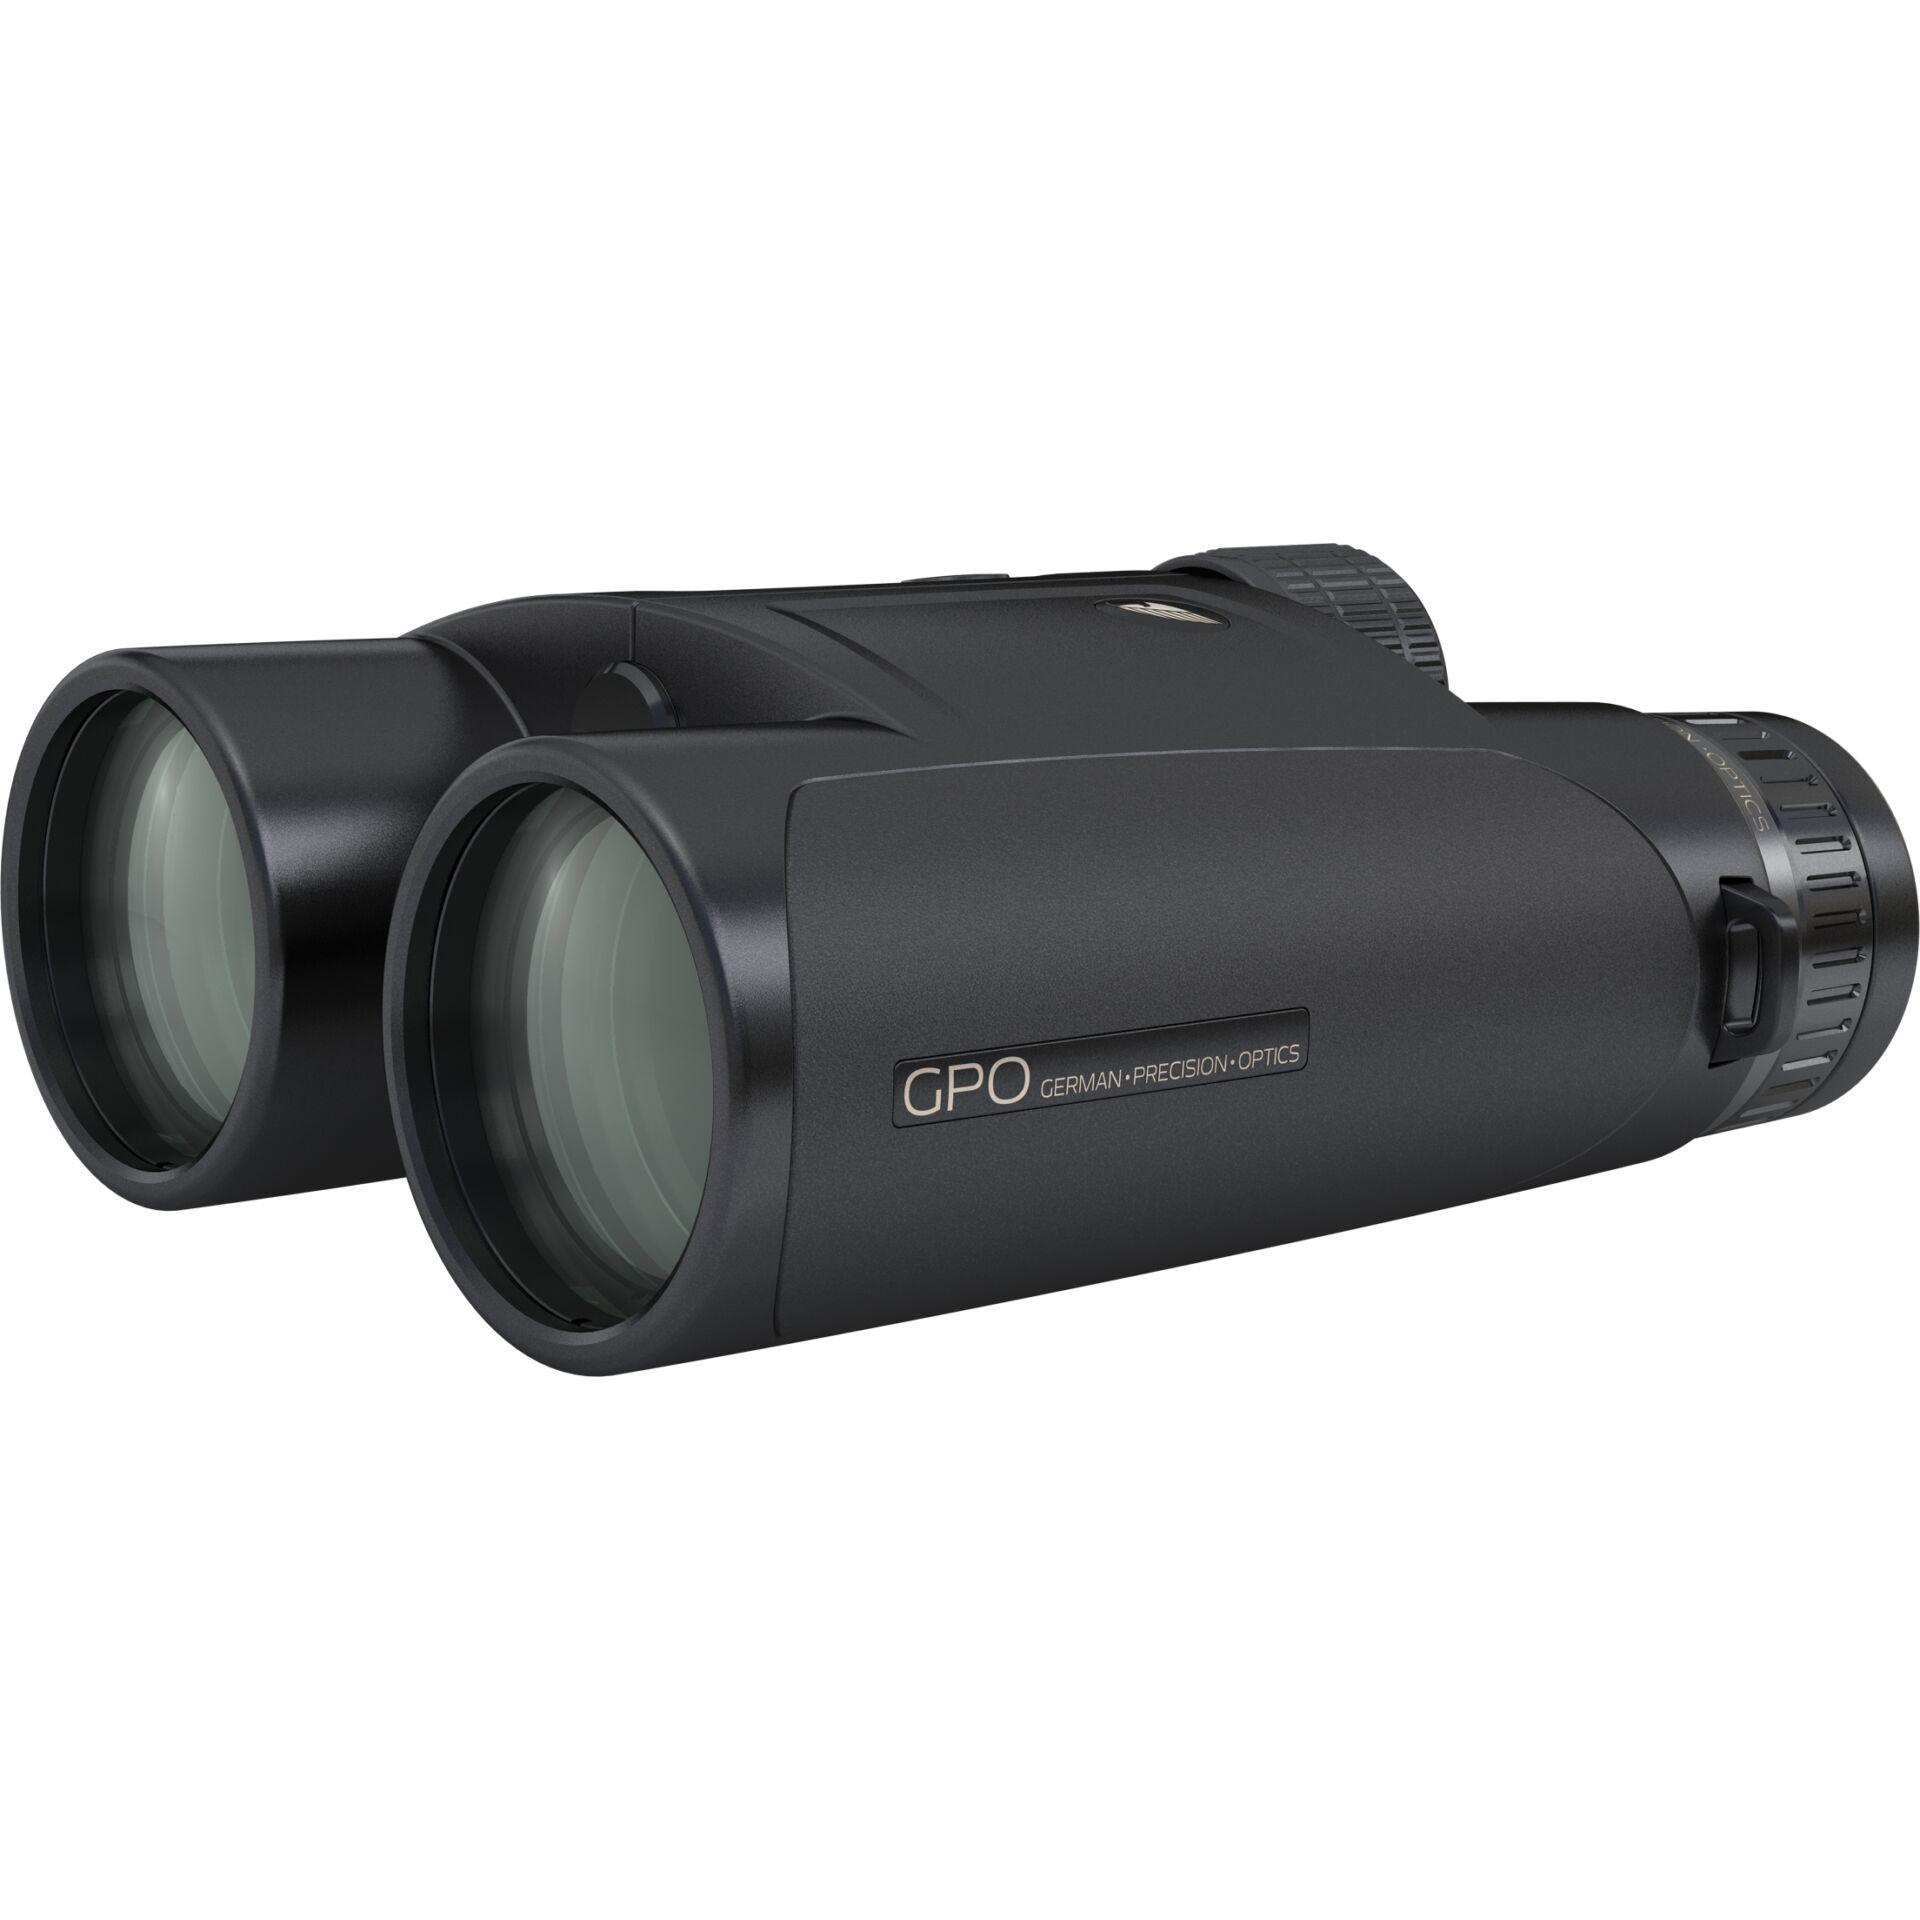 GPO Rangeguide 2800  8x50